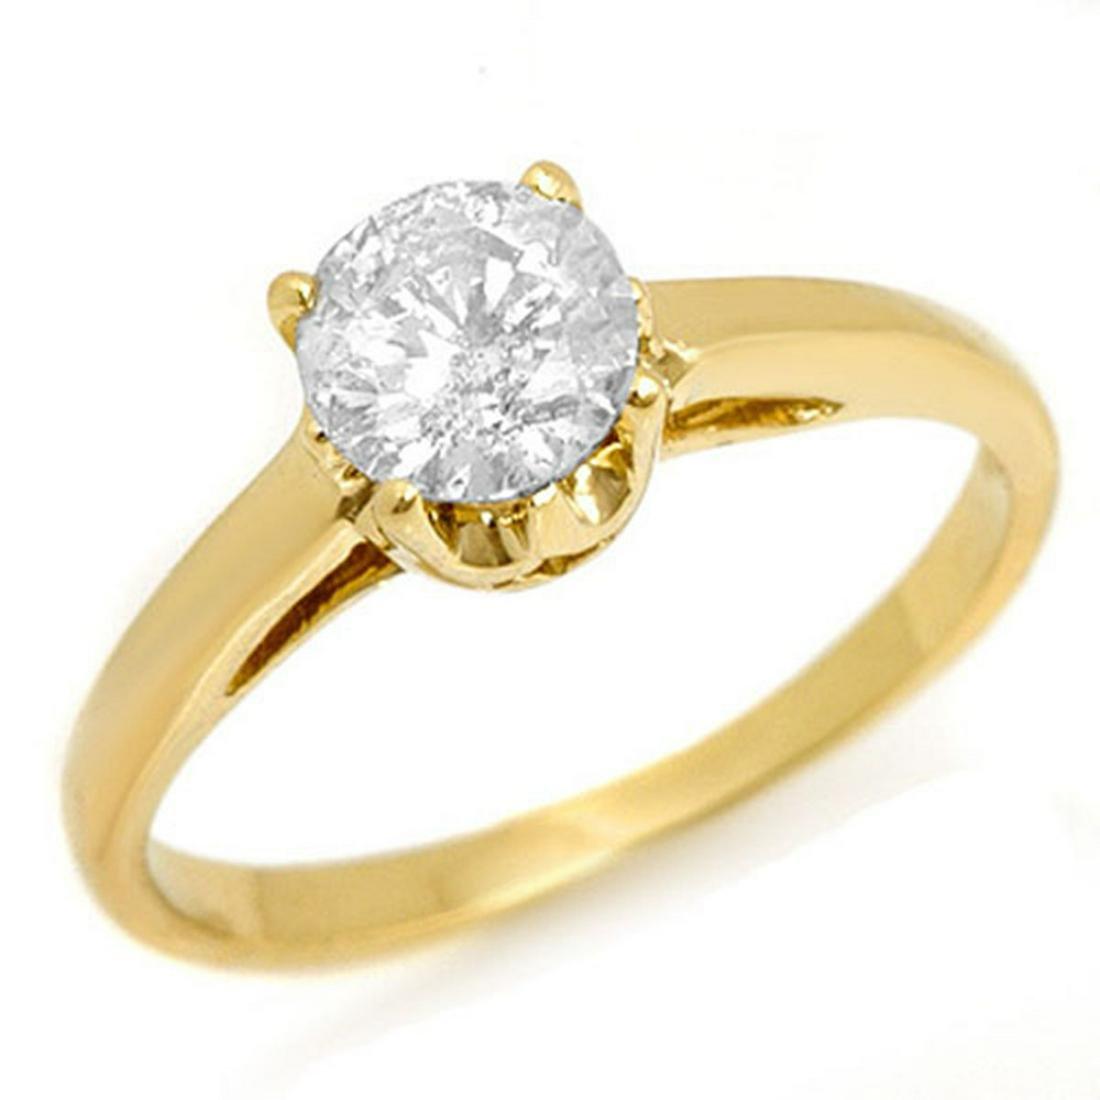 0.80 ctw VS/SI Diamond Ring 14K Yellow Gold